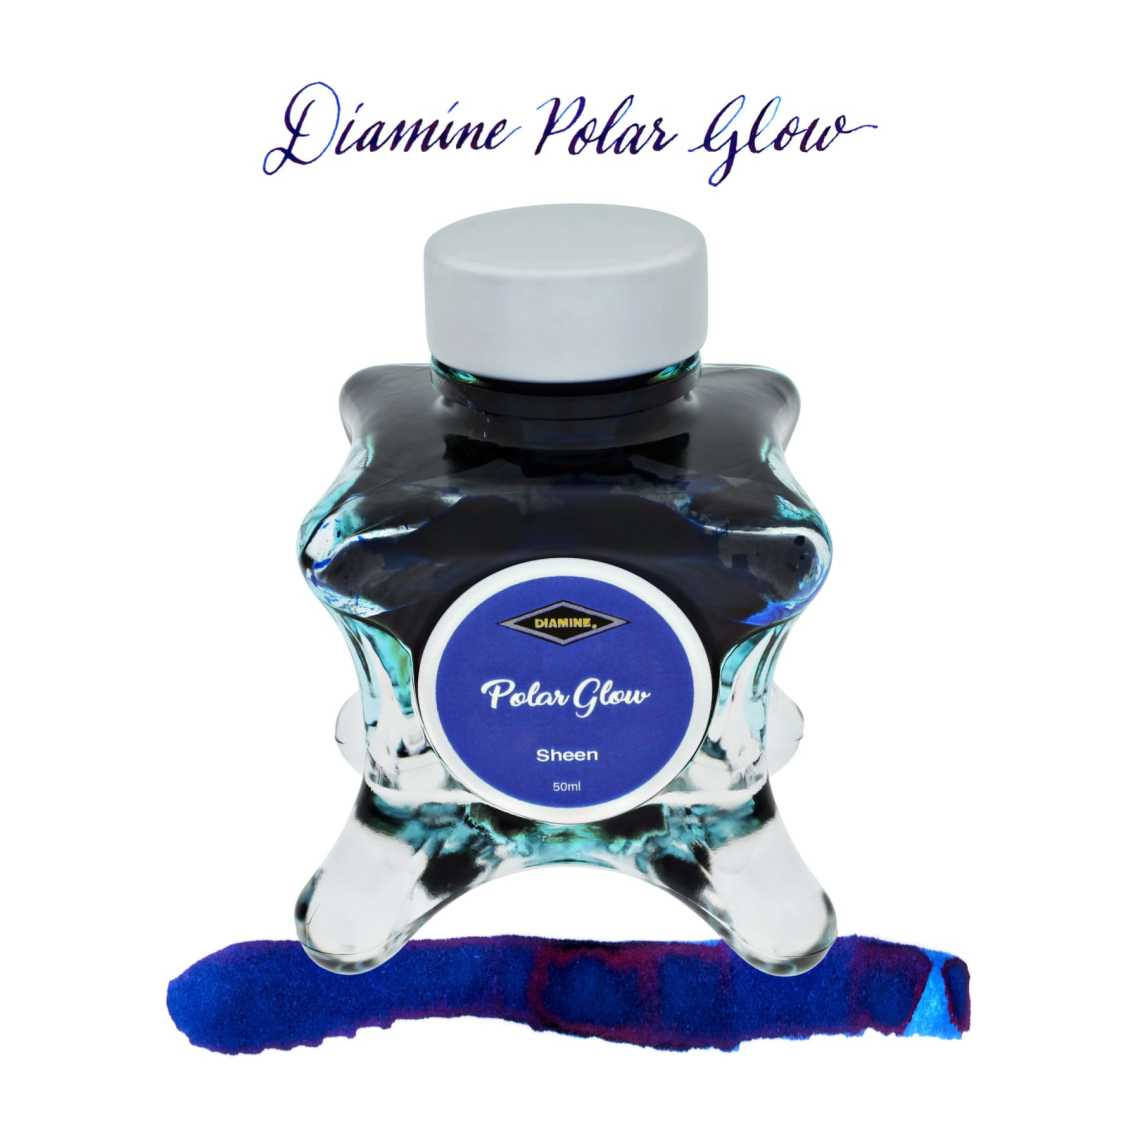 Diamine Inkvent Blue Edition Ink bottle